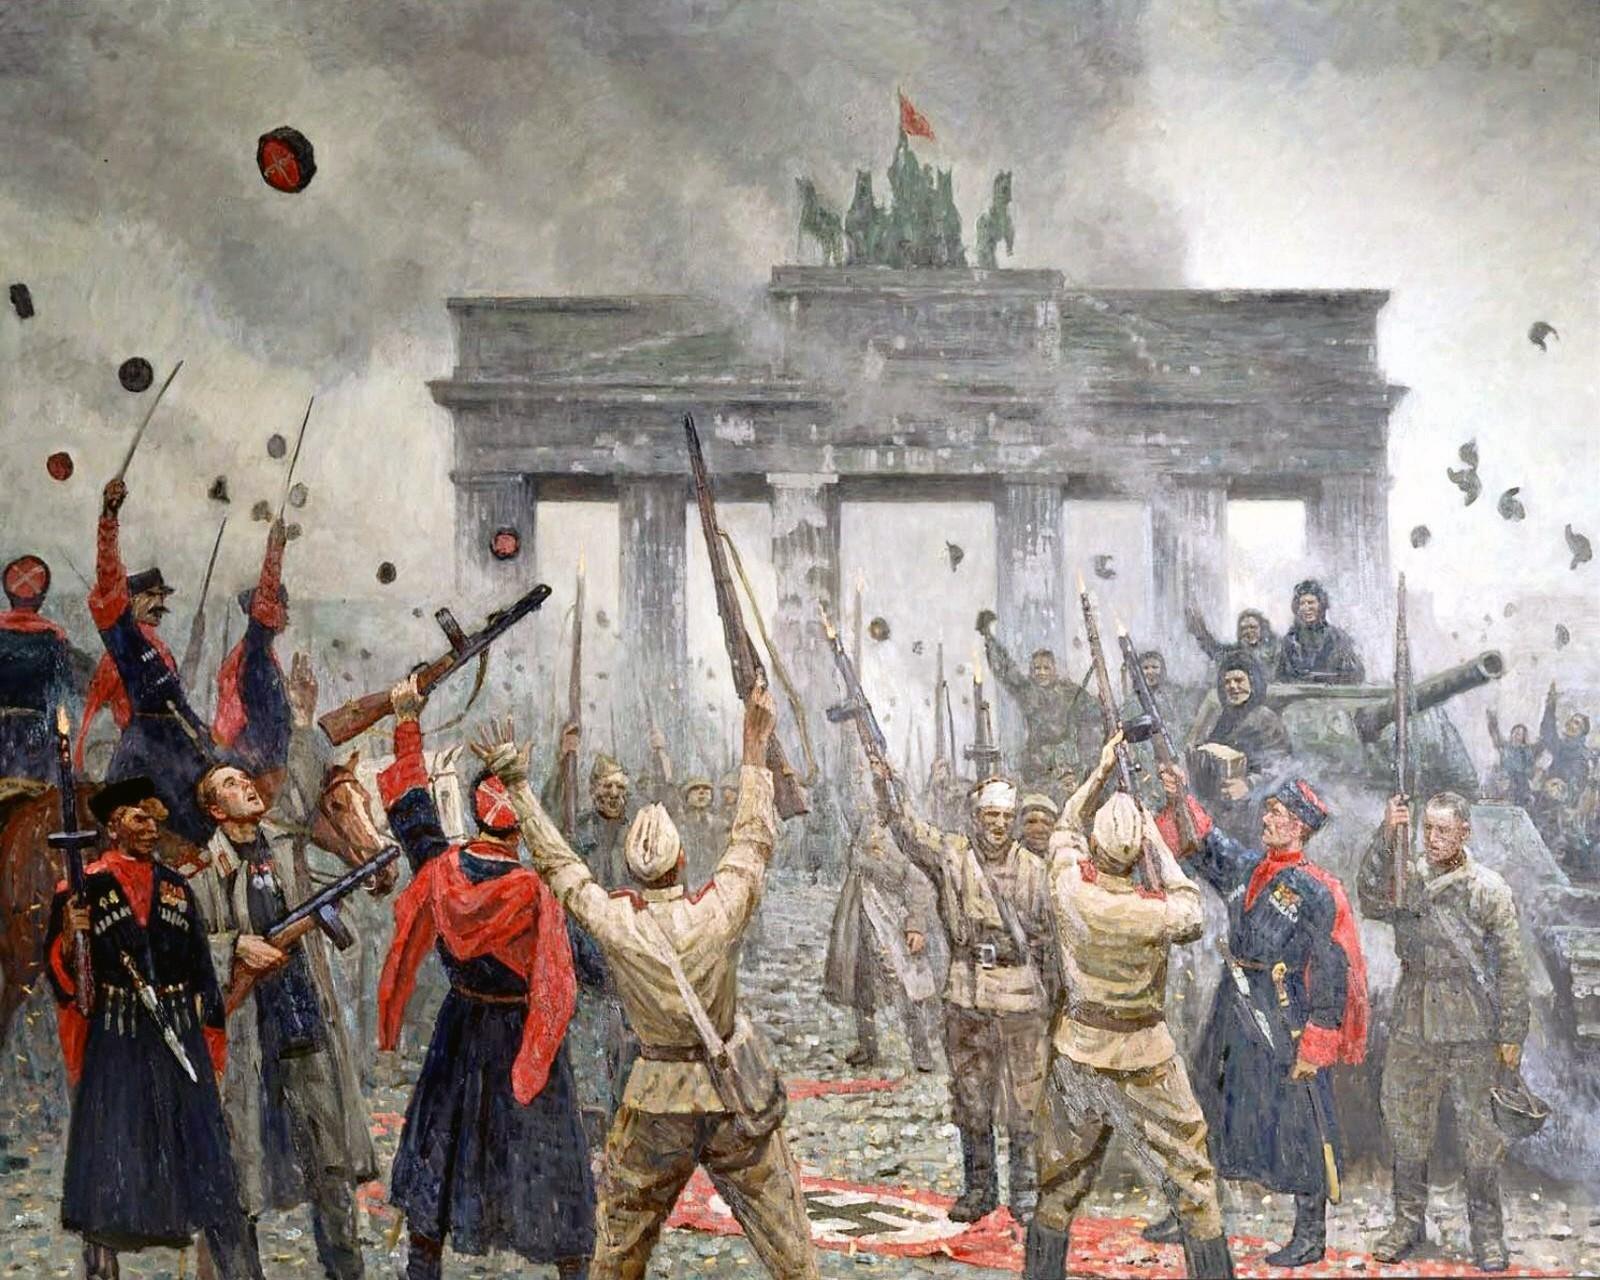 battle of berlin wallpaper - photo #8